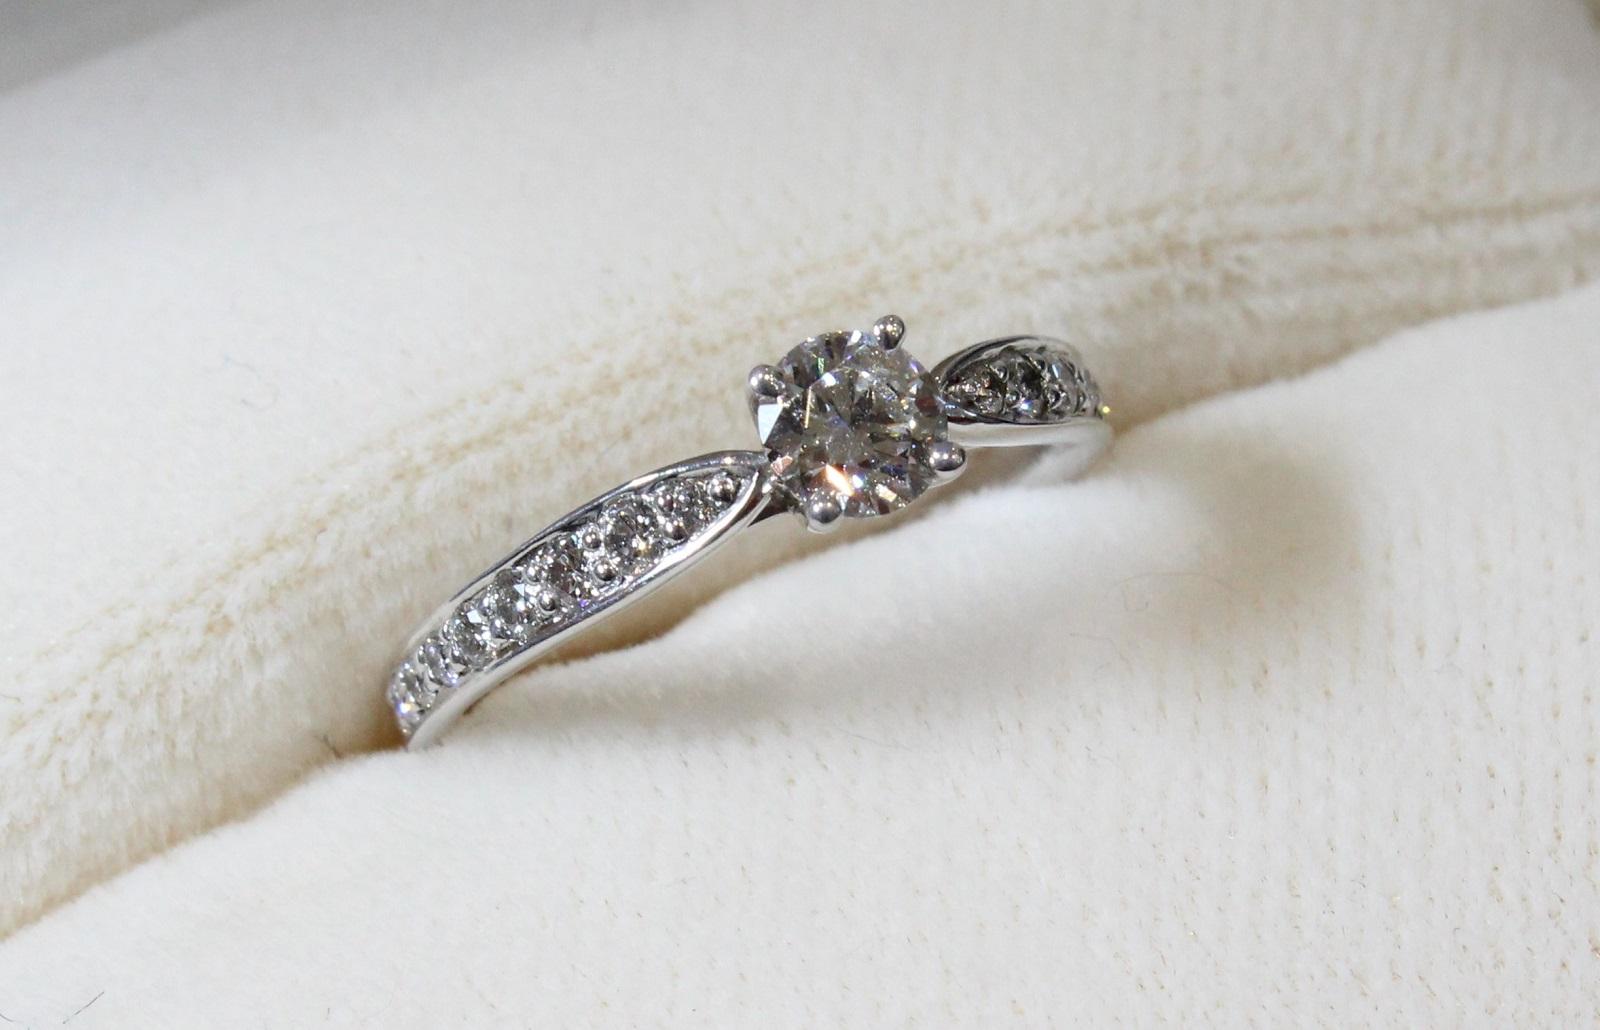 【Tiffany&㏇(ティファニー)】ハーモニーダイヤモンドリングダイヤモンド0.28ct Pt950 2.8g 6.5号上品 高級 箱/布袋付ギフト包装可 【中古】